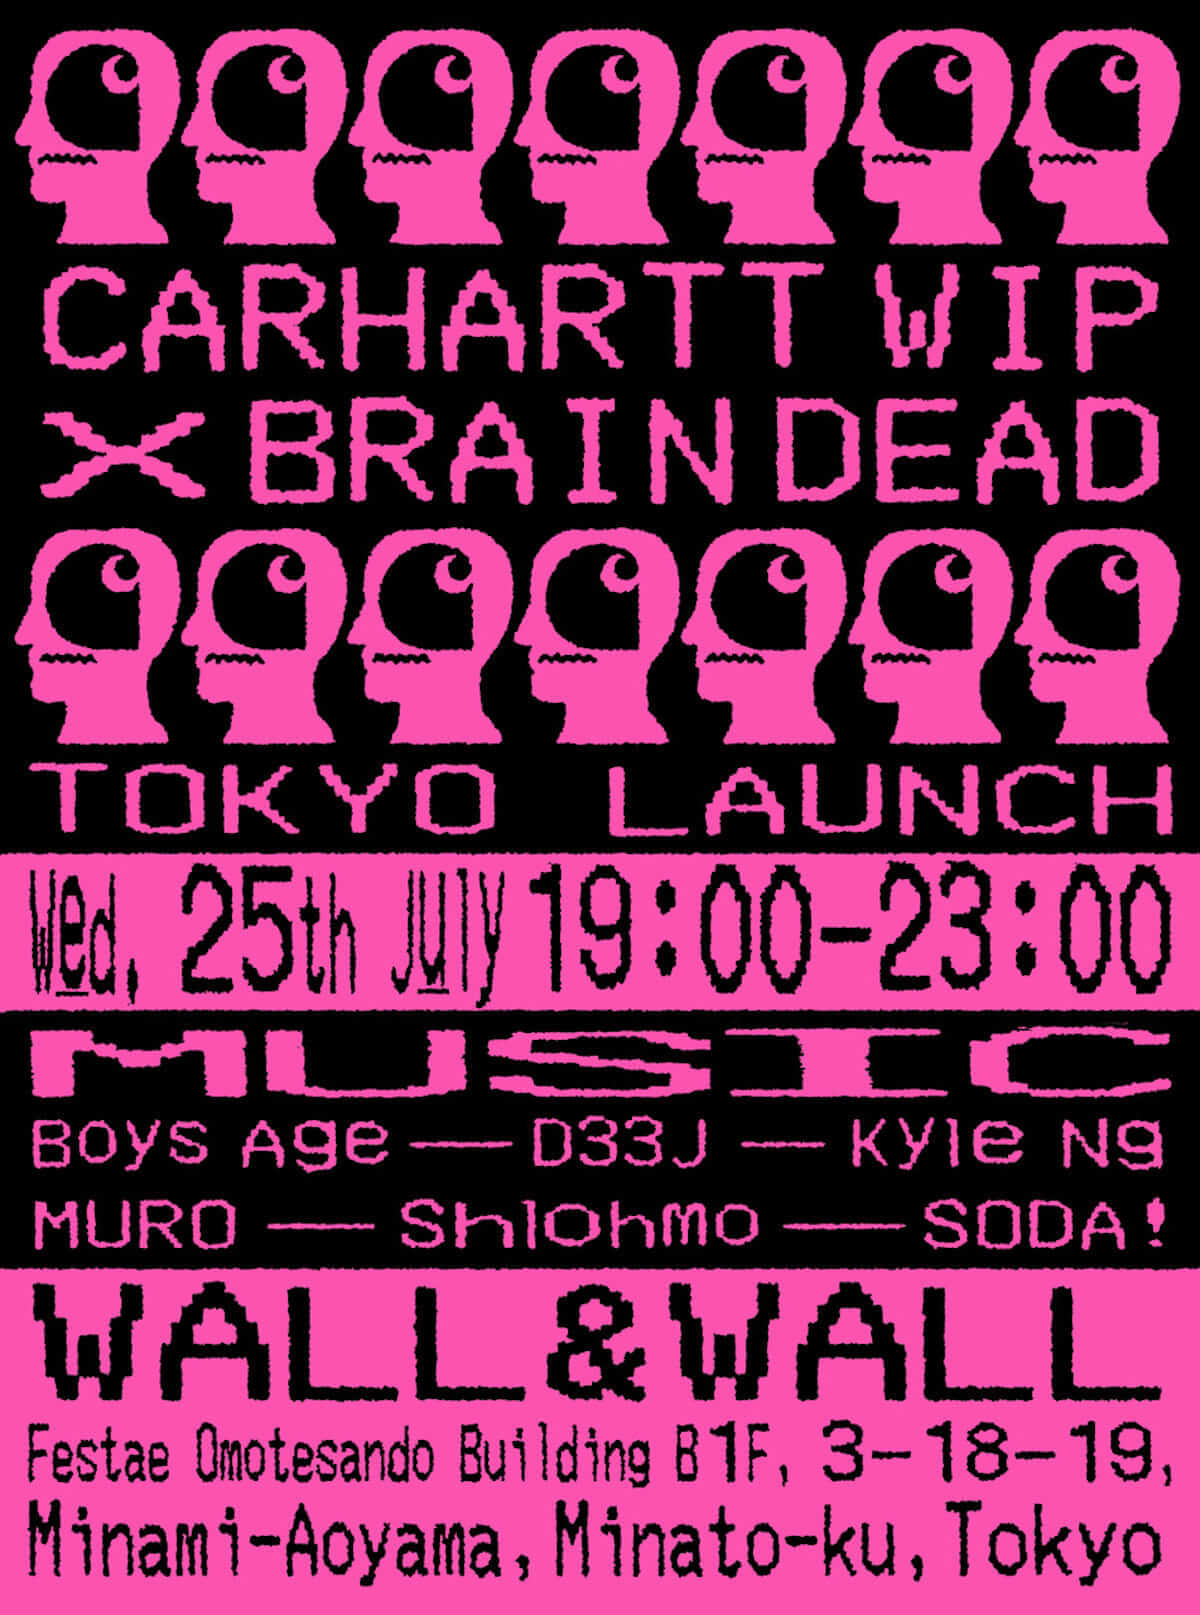 Carhartt WIPとBRAIN DEADのコラボレーション企画のローンチパーティーが開催|SODA!やBoys Age、MURO、D33J、Shlohmoらが登場 music180724-brain-dead-carhartt--1200x1615